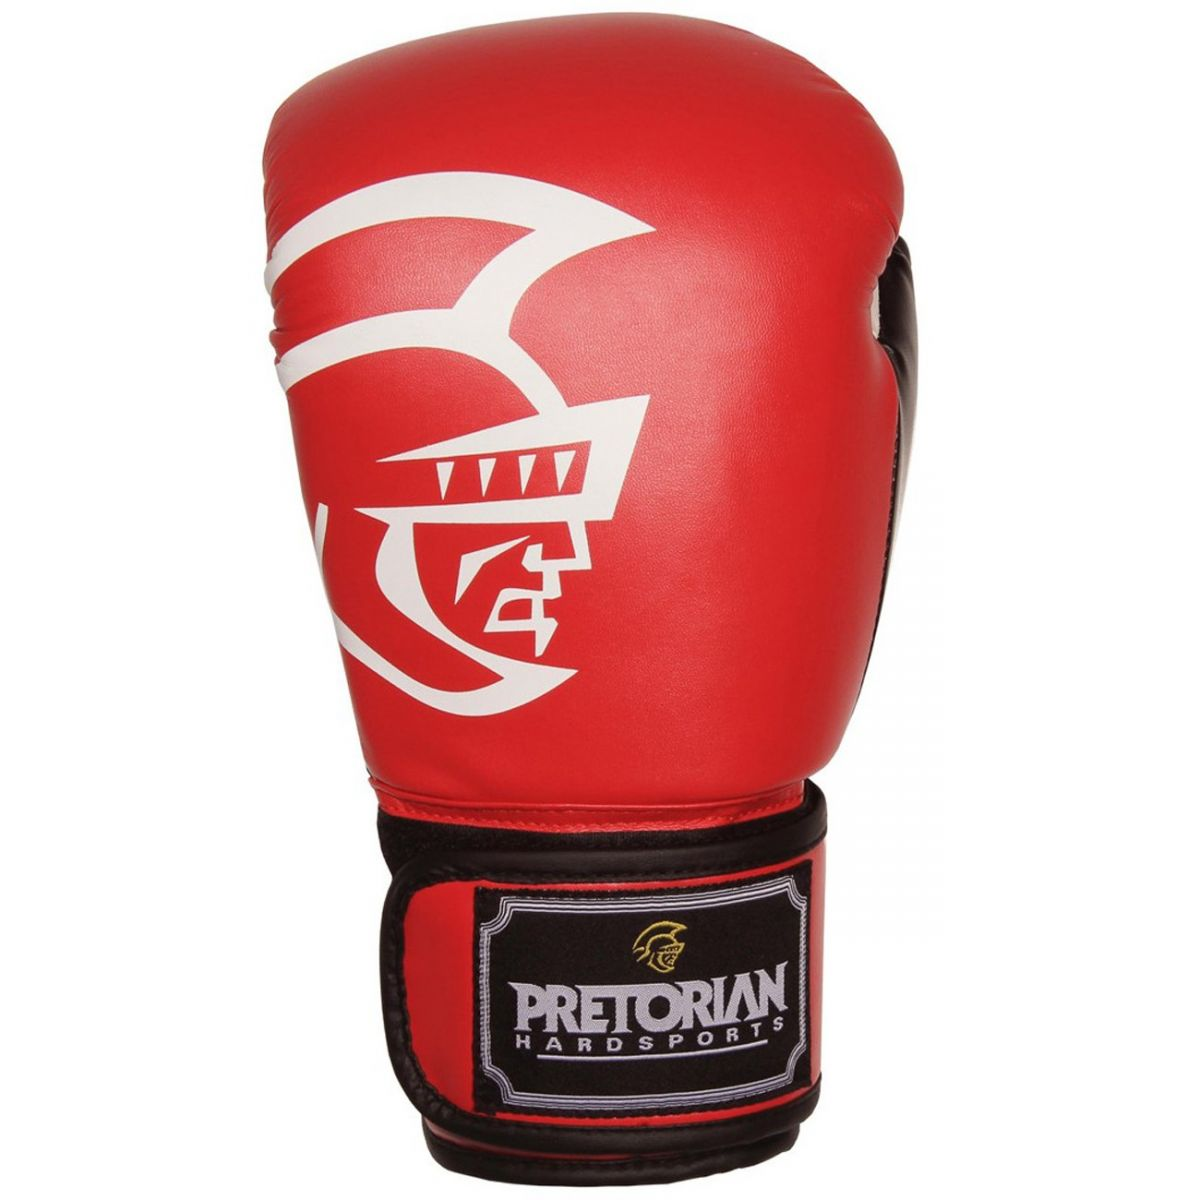 Luvas Boxe / Muay Thai - Training Series - Vermelho/Preto- Pretorian - 10/12/14/16 OZ